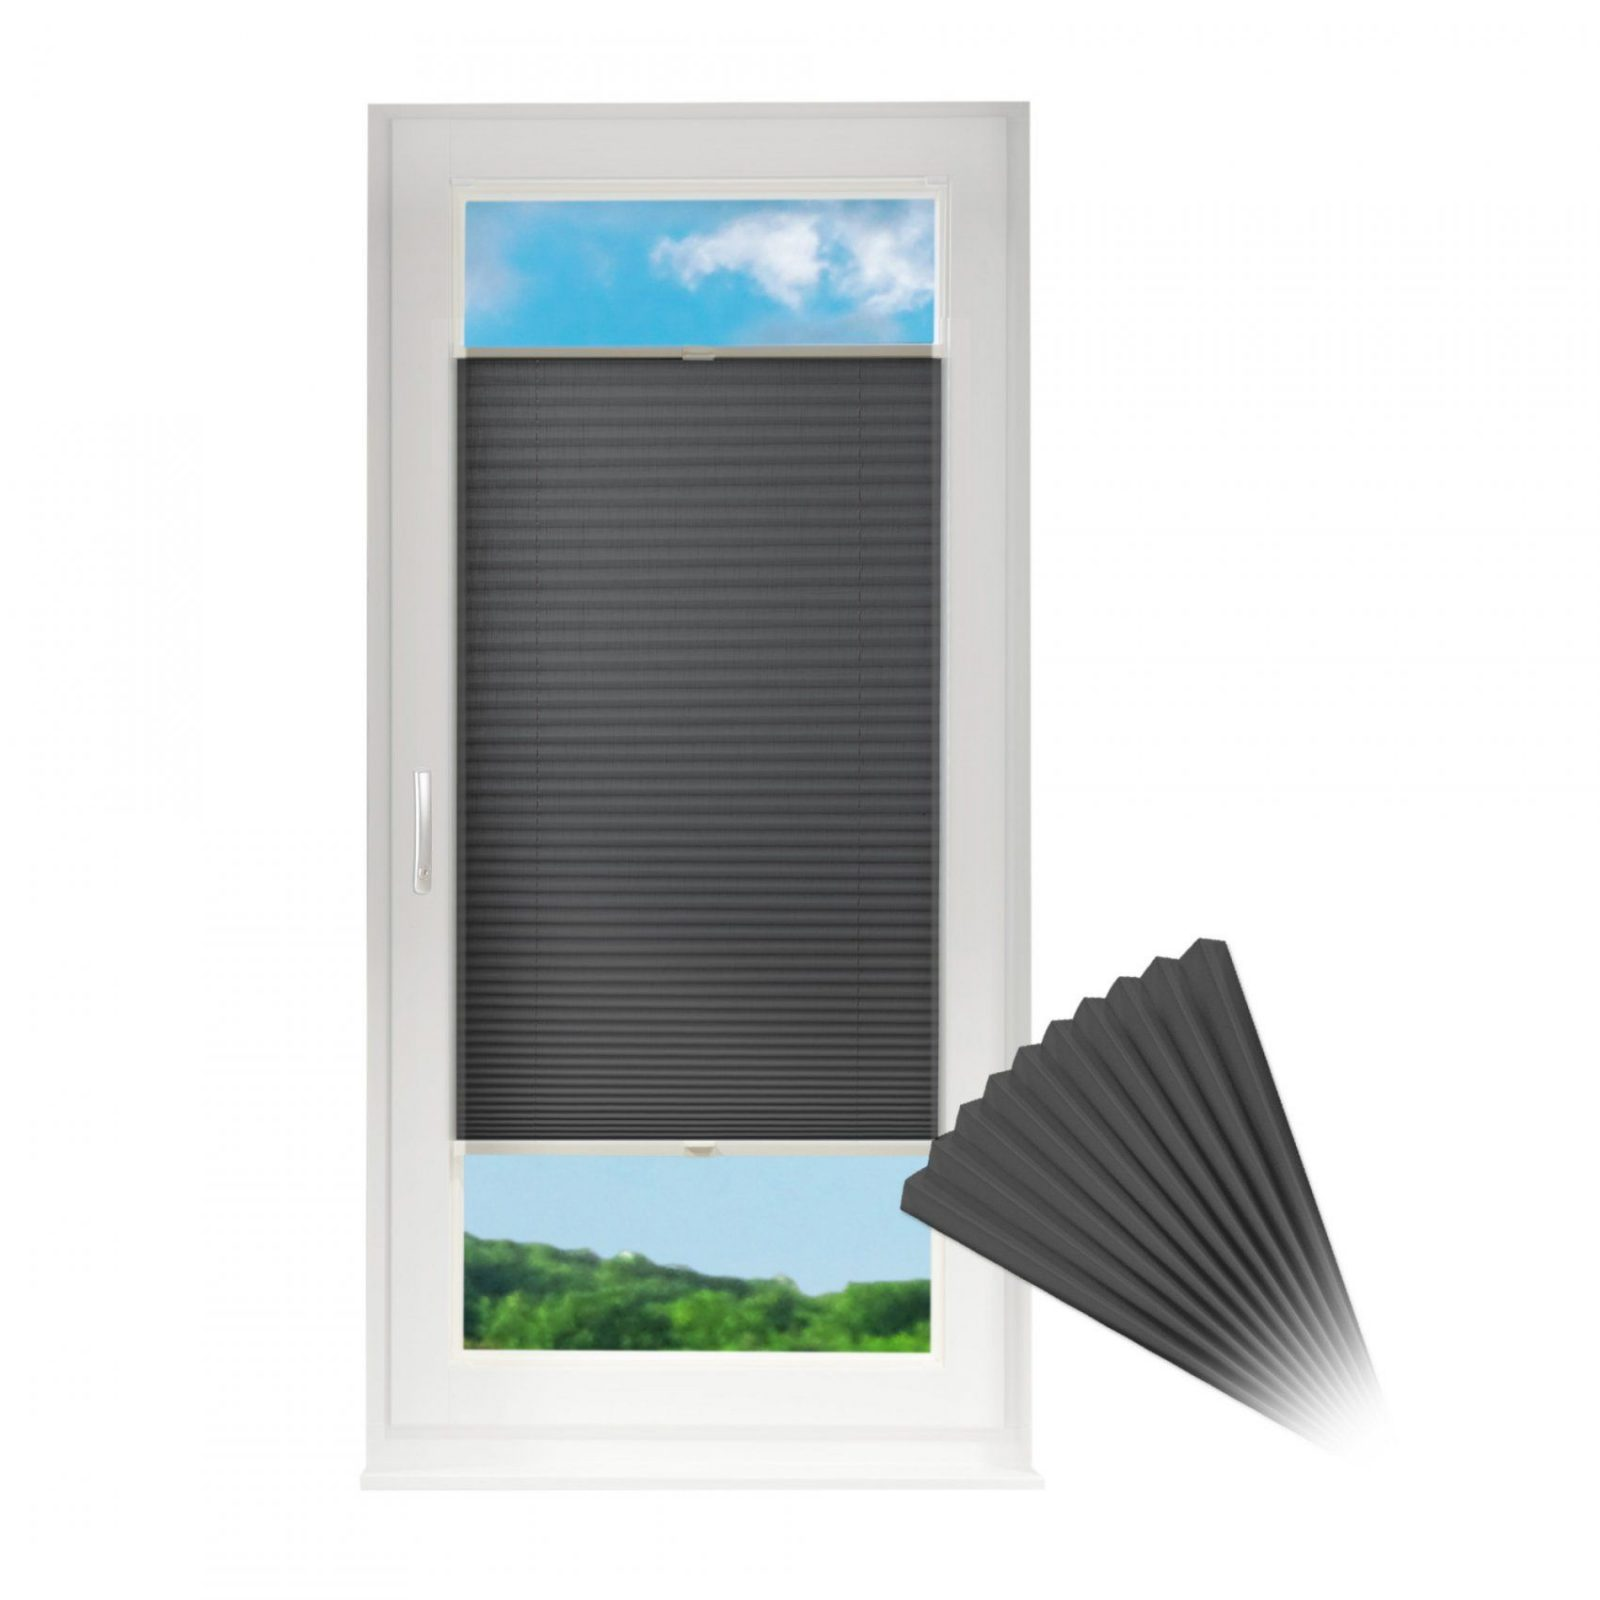 Fenster Jalousien Innen Wt54 – Hitoiro von Jalousien Innen Zum Klemmen Photo